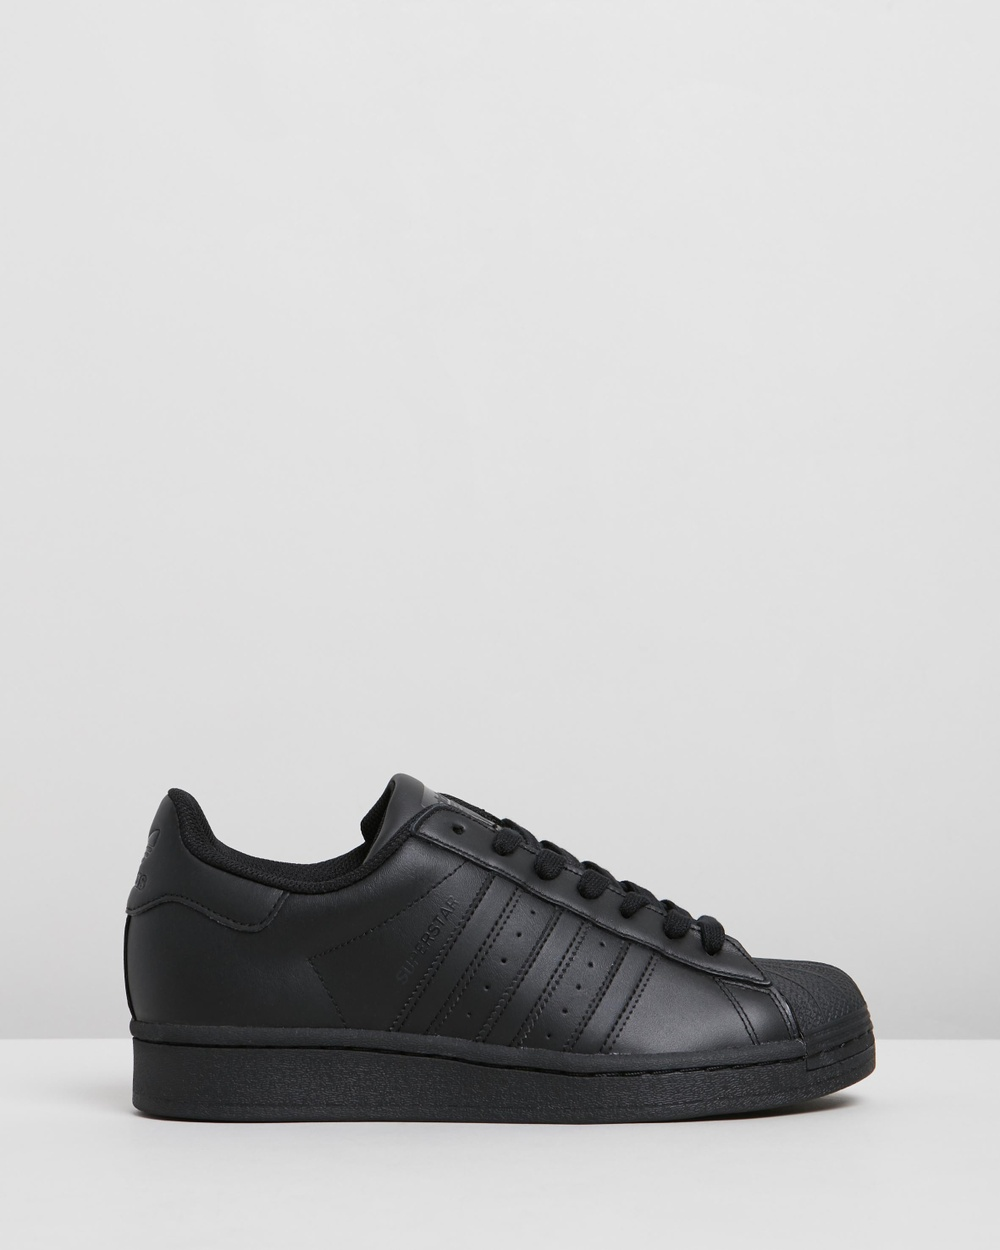 adidas Originals Superstar Shoes Sneakers Black